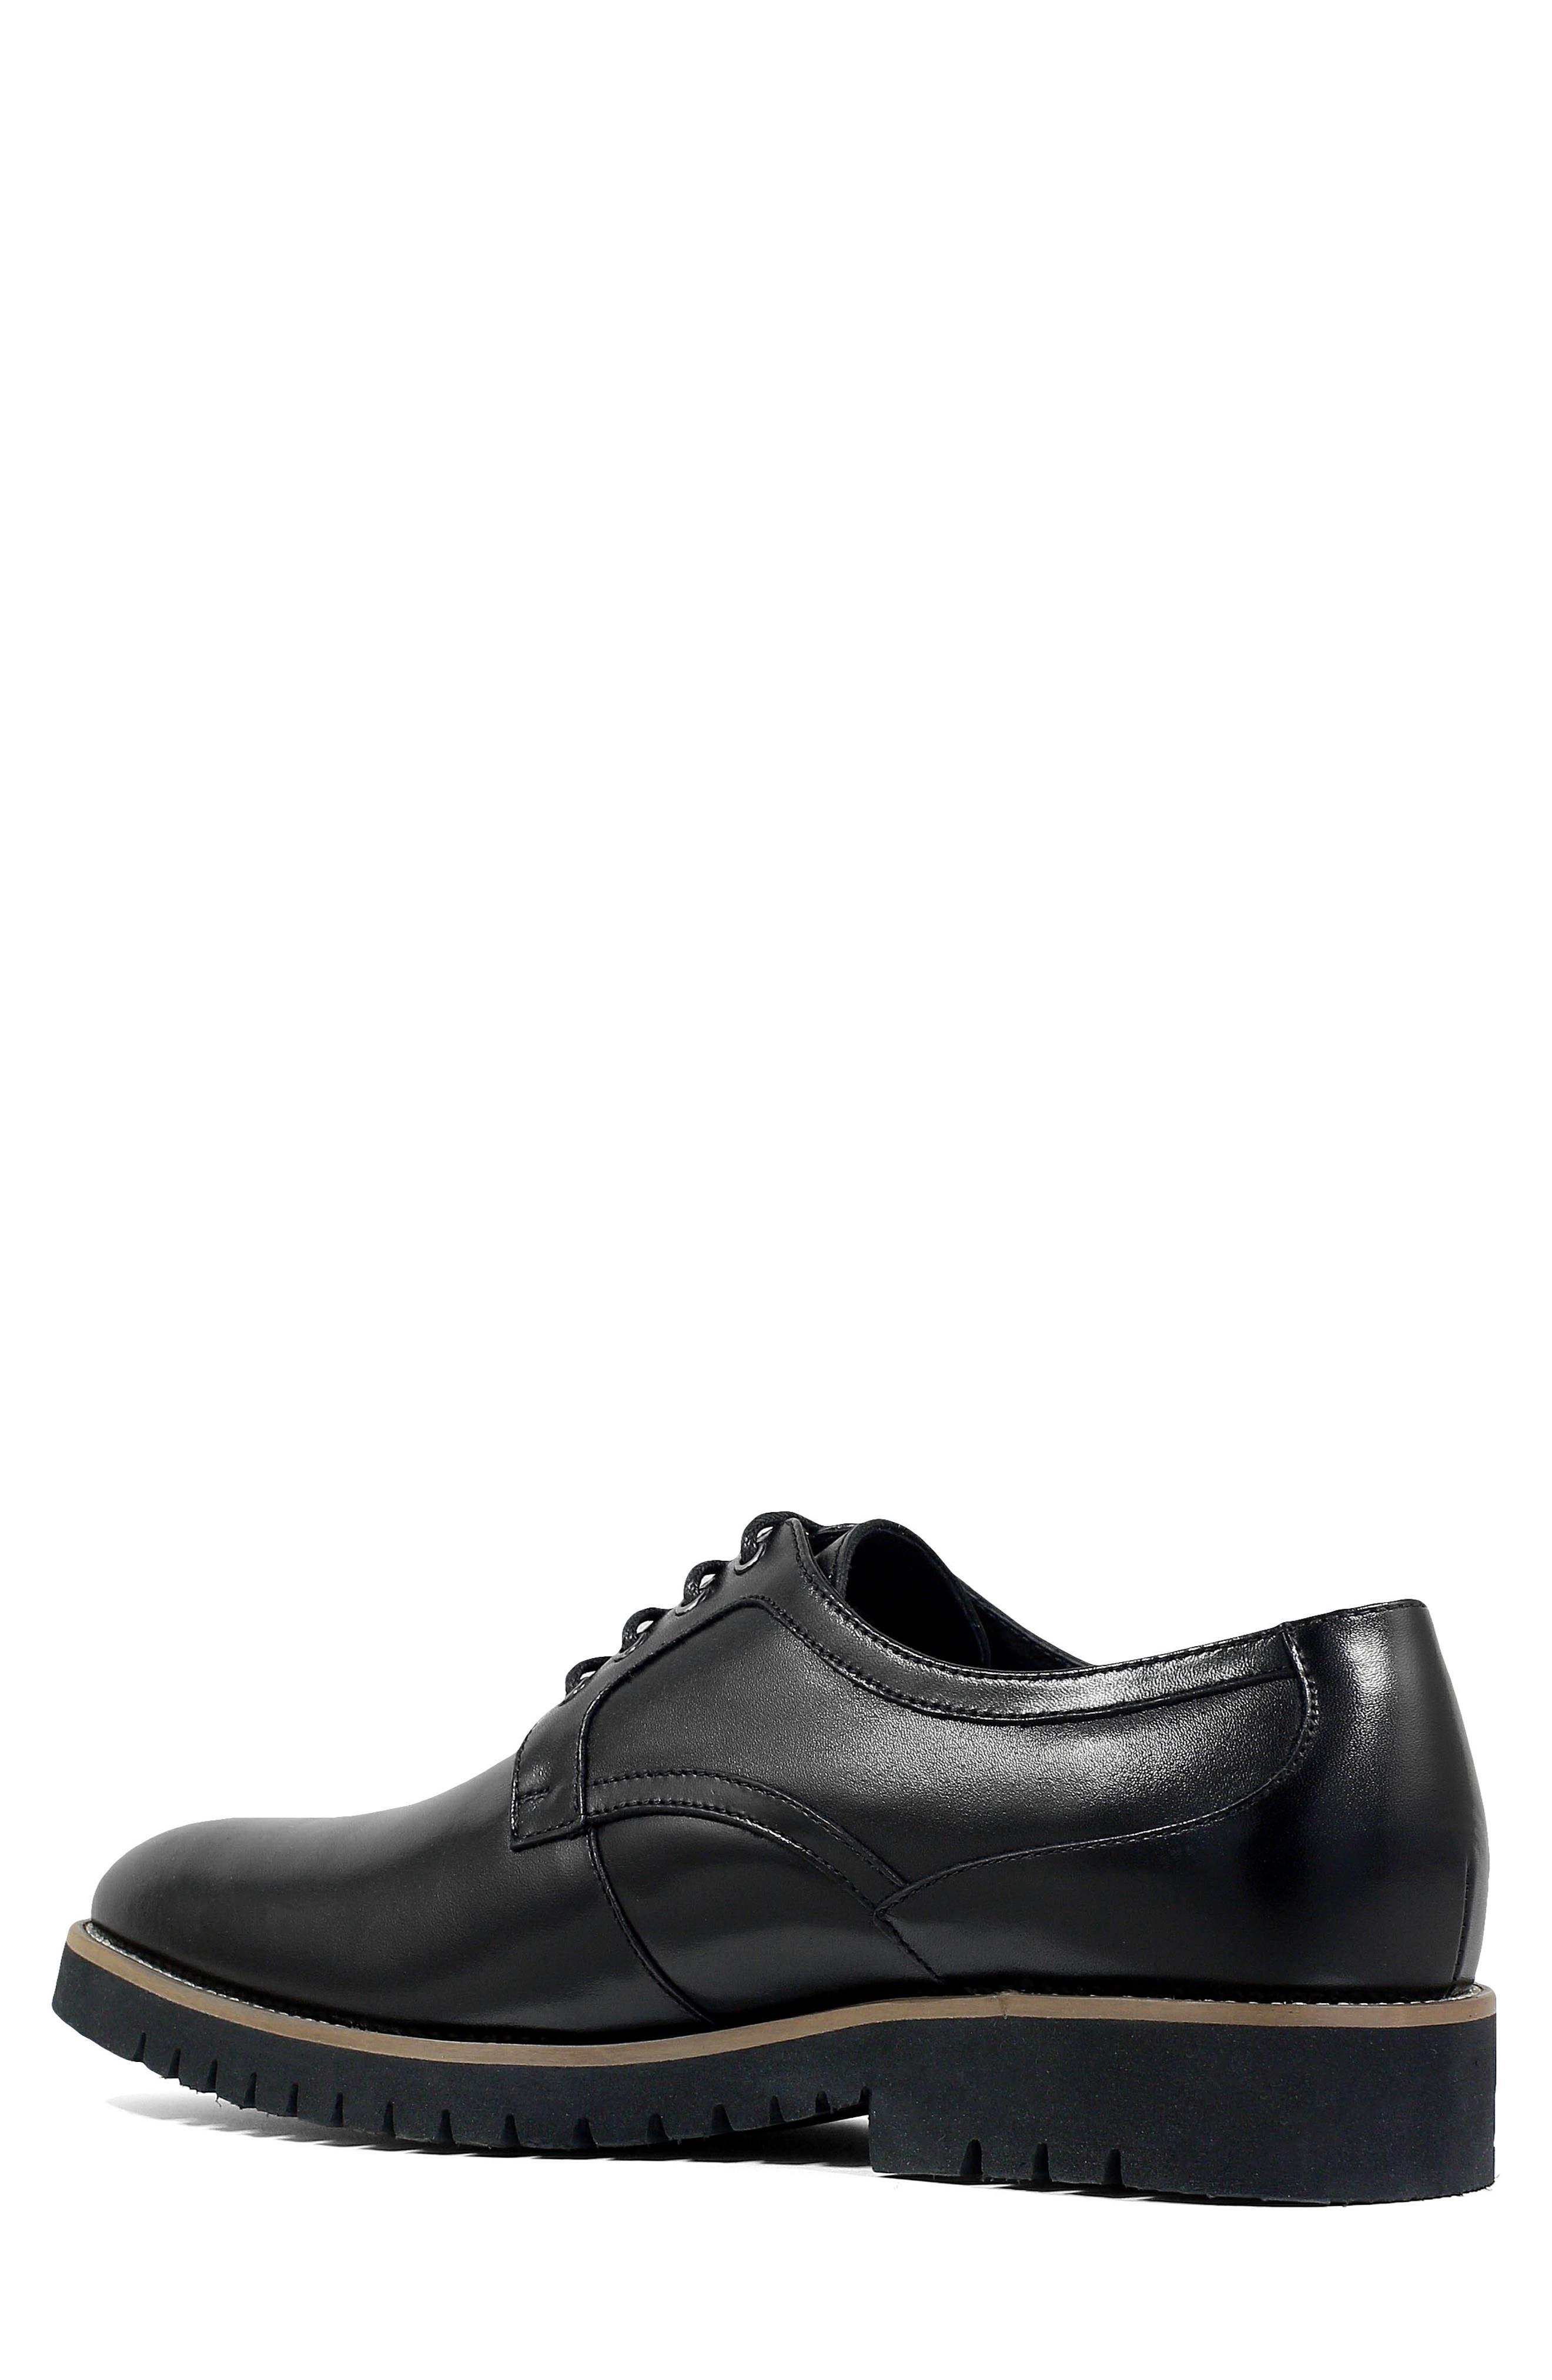 Barclay Plain Toe Derby,                             Alternate thumbnail 2, color,                             BLACK LEATHER